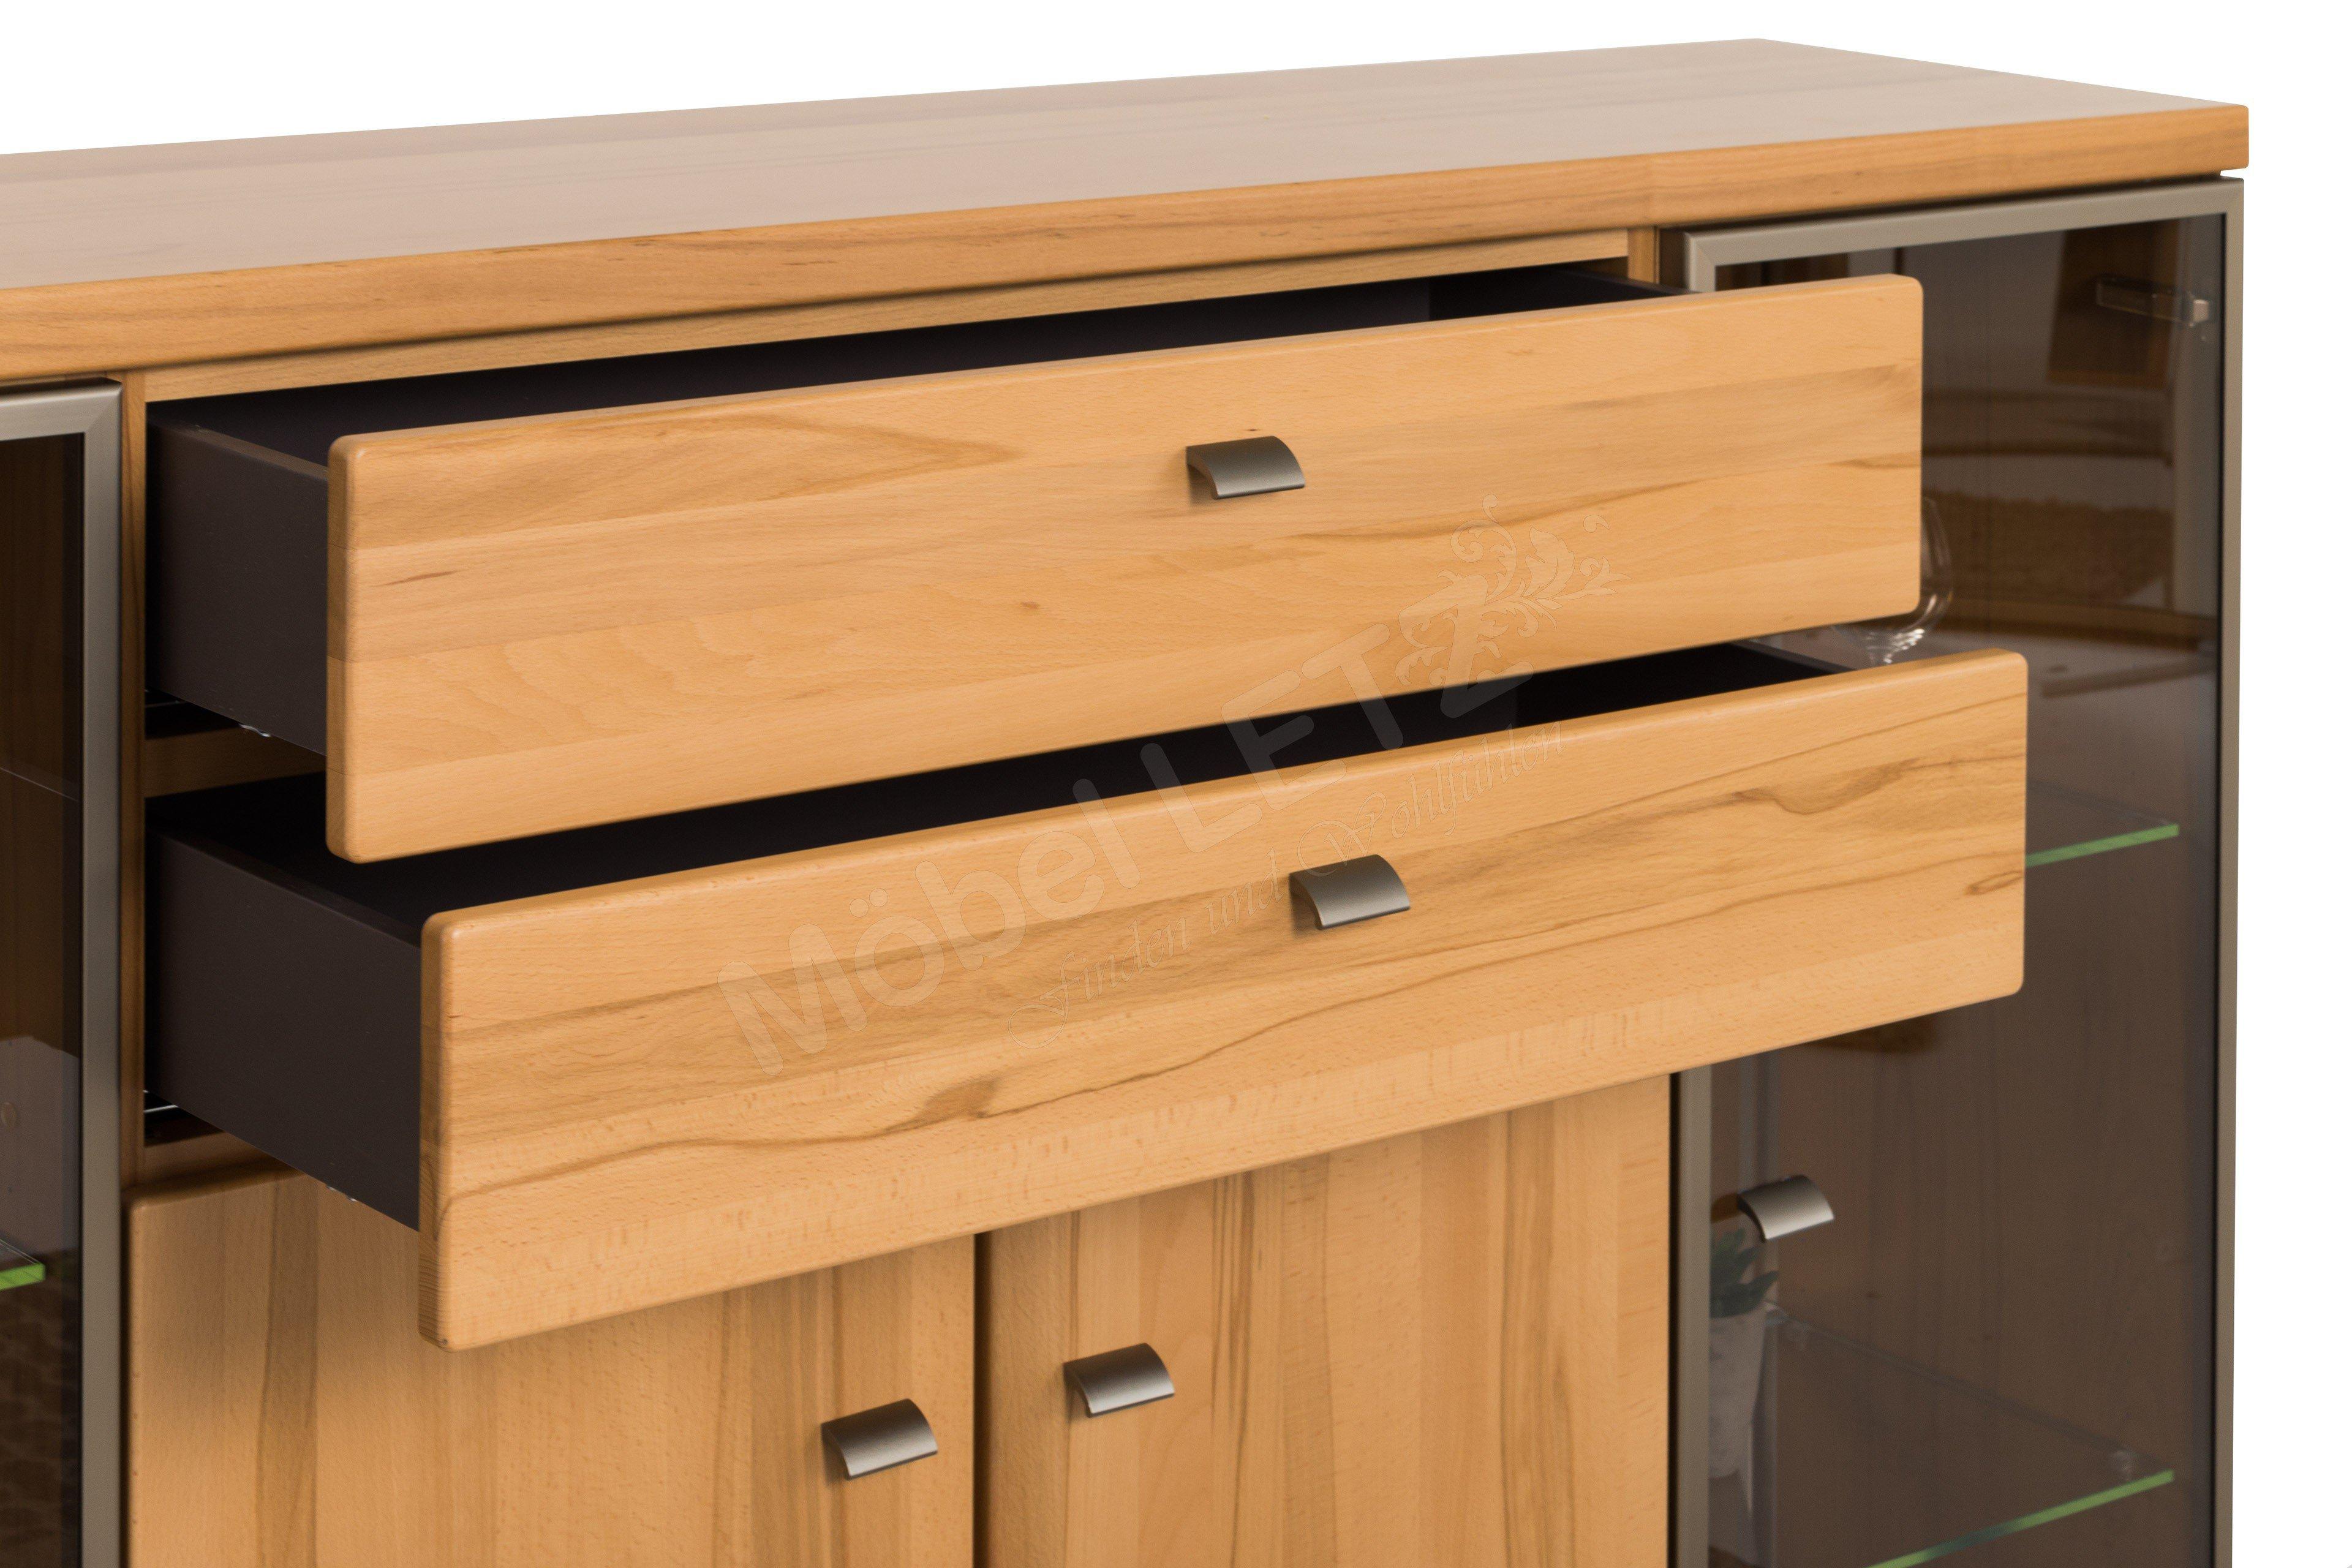 rietberger m belwerke highboard largo 6902 mit beleuchtung m bel letz ihr online shop. Black Bedroom Furniture Sets. Home Design Ideas